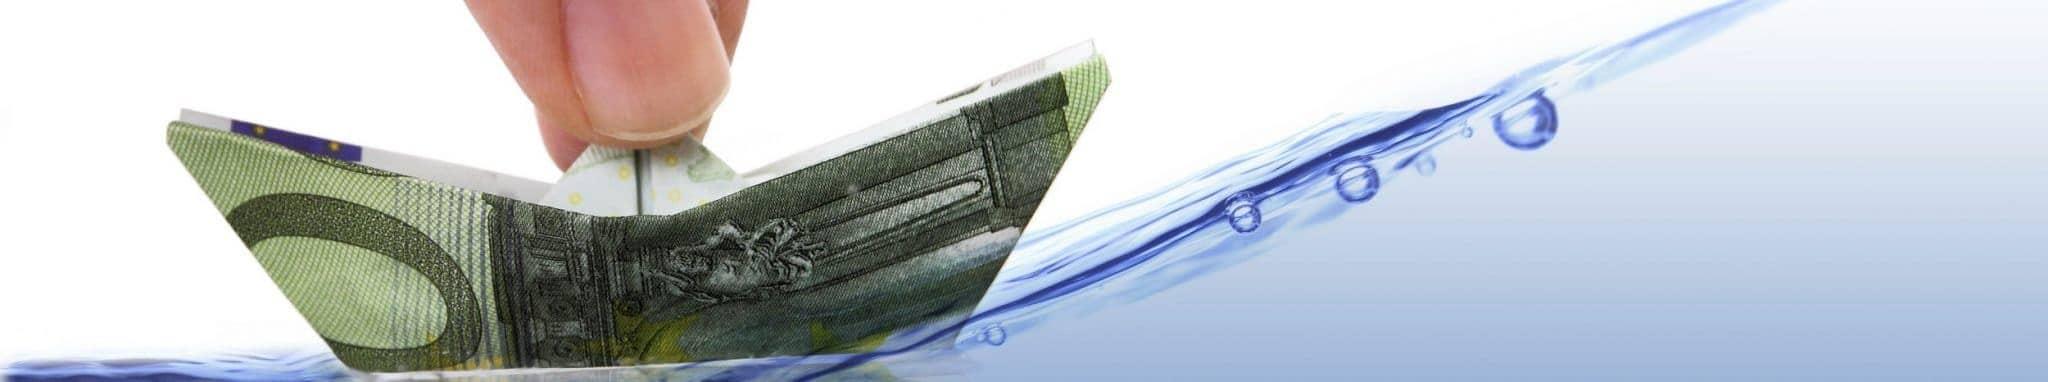 Meereswirtschaft